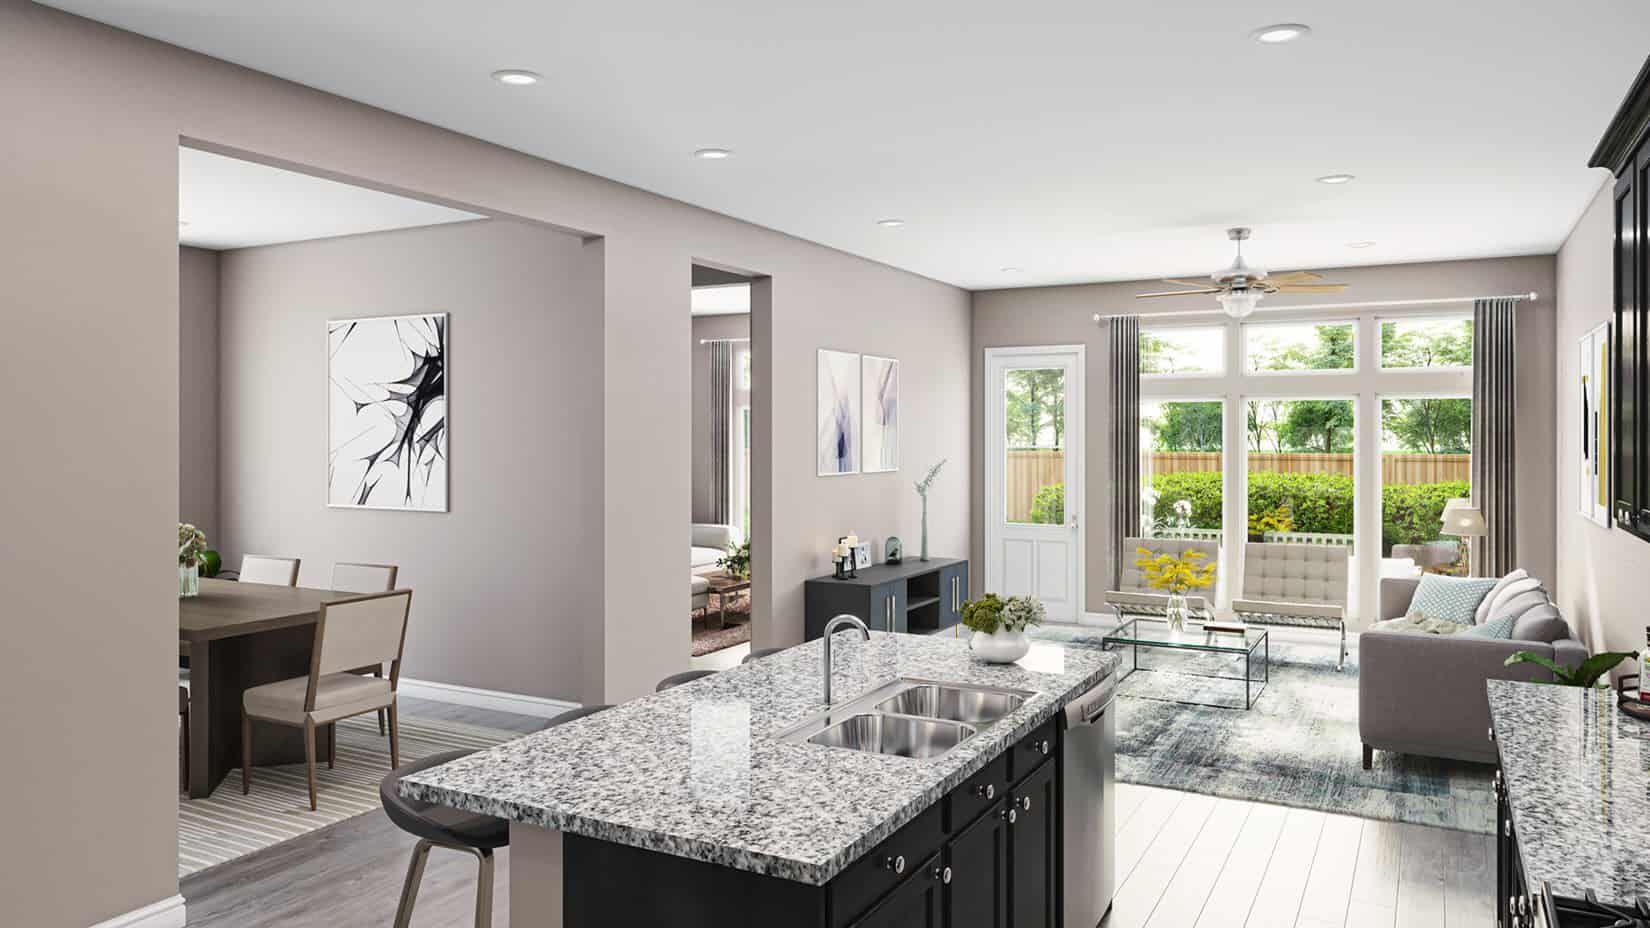 Representative Only | Merganser Plan | Kitchen & F:Representative Only | Merganser Plan | Kitchen & Family Room